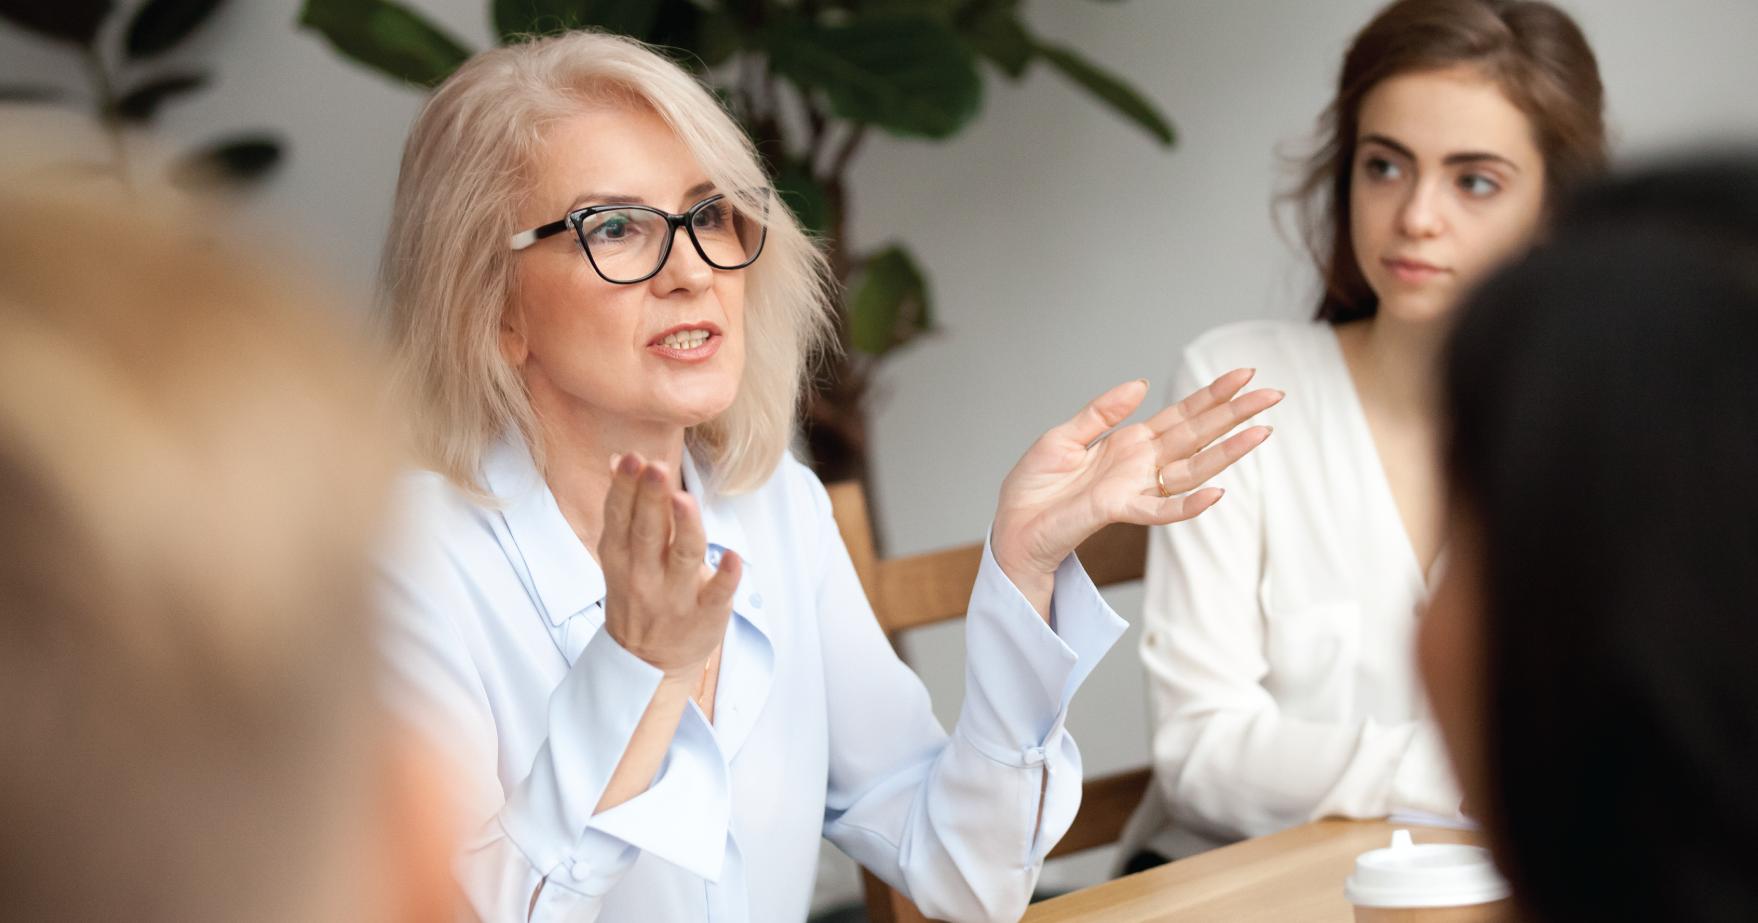 Women Speaking in A Meeting